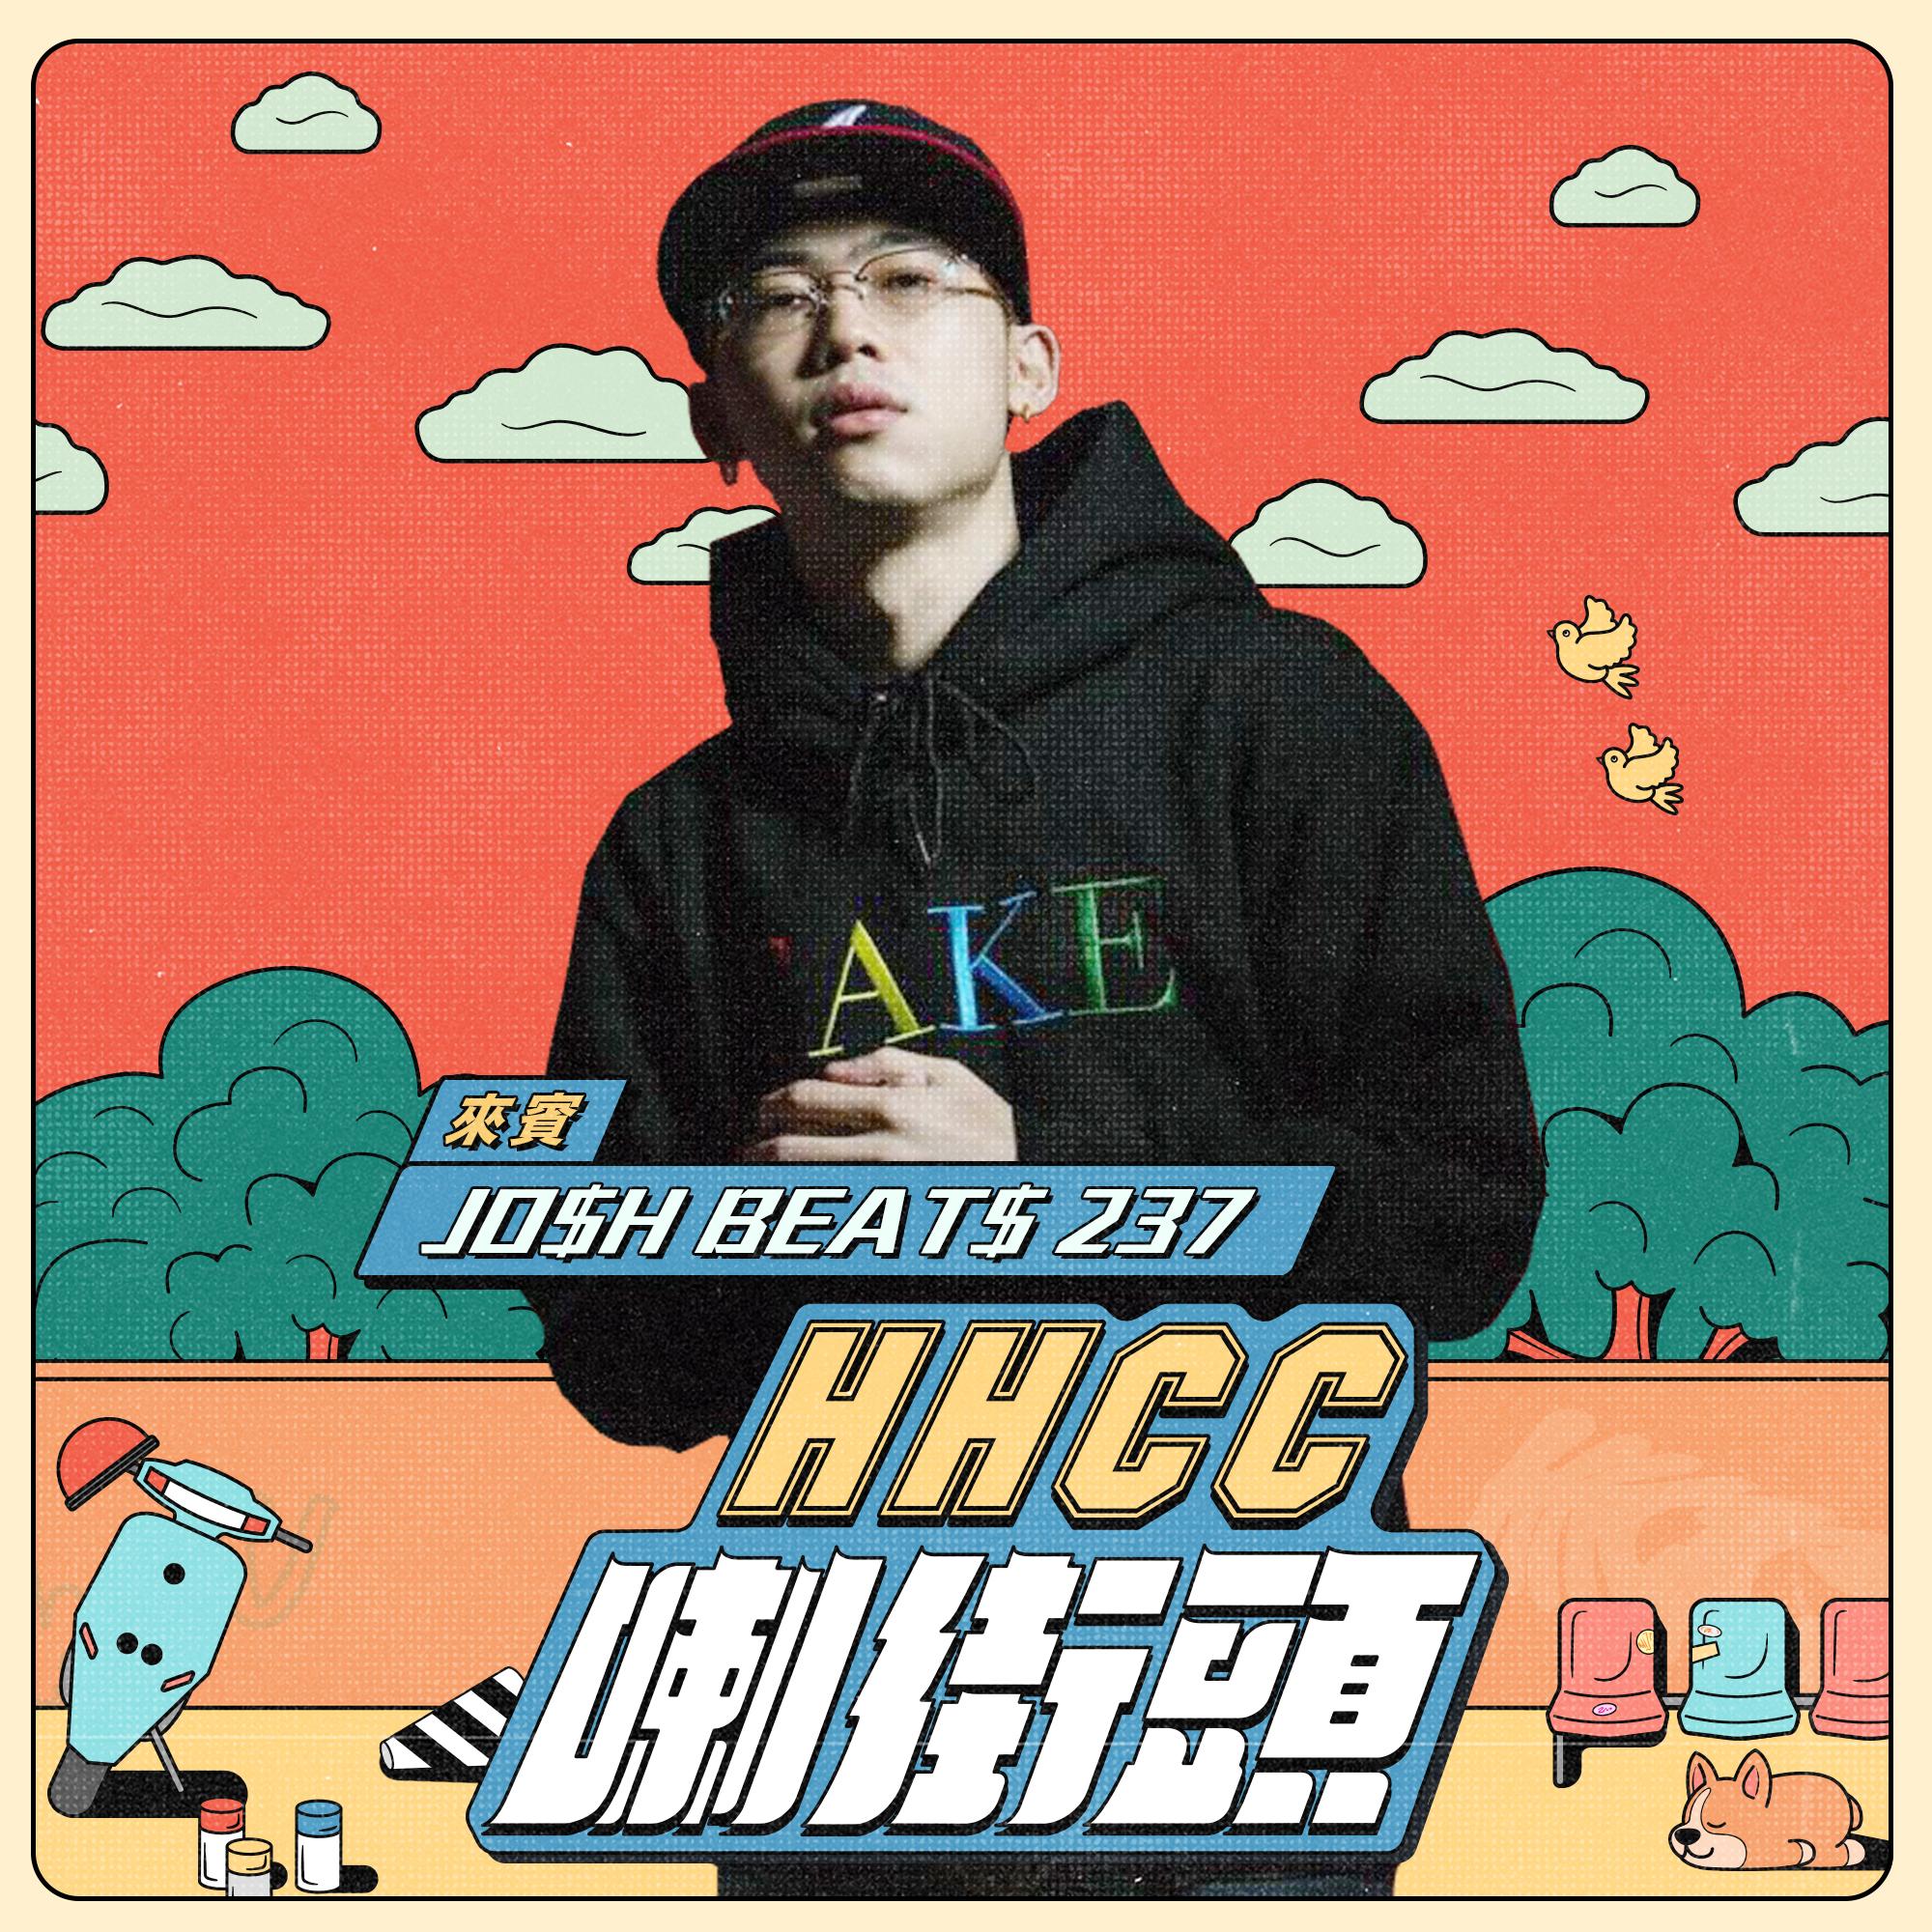 Ep.29 Call-in喇街頭 ft. JO$H BEAT$ 237:最接近中國嘻哈圈的辣個男人